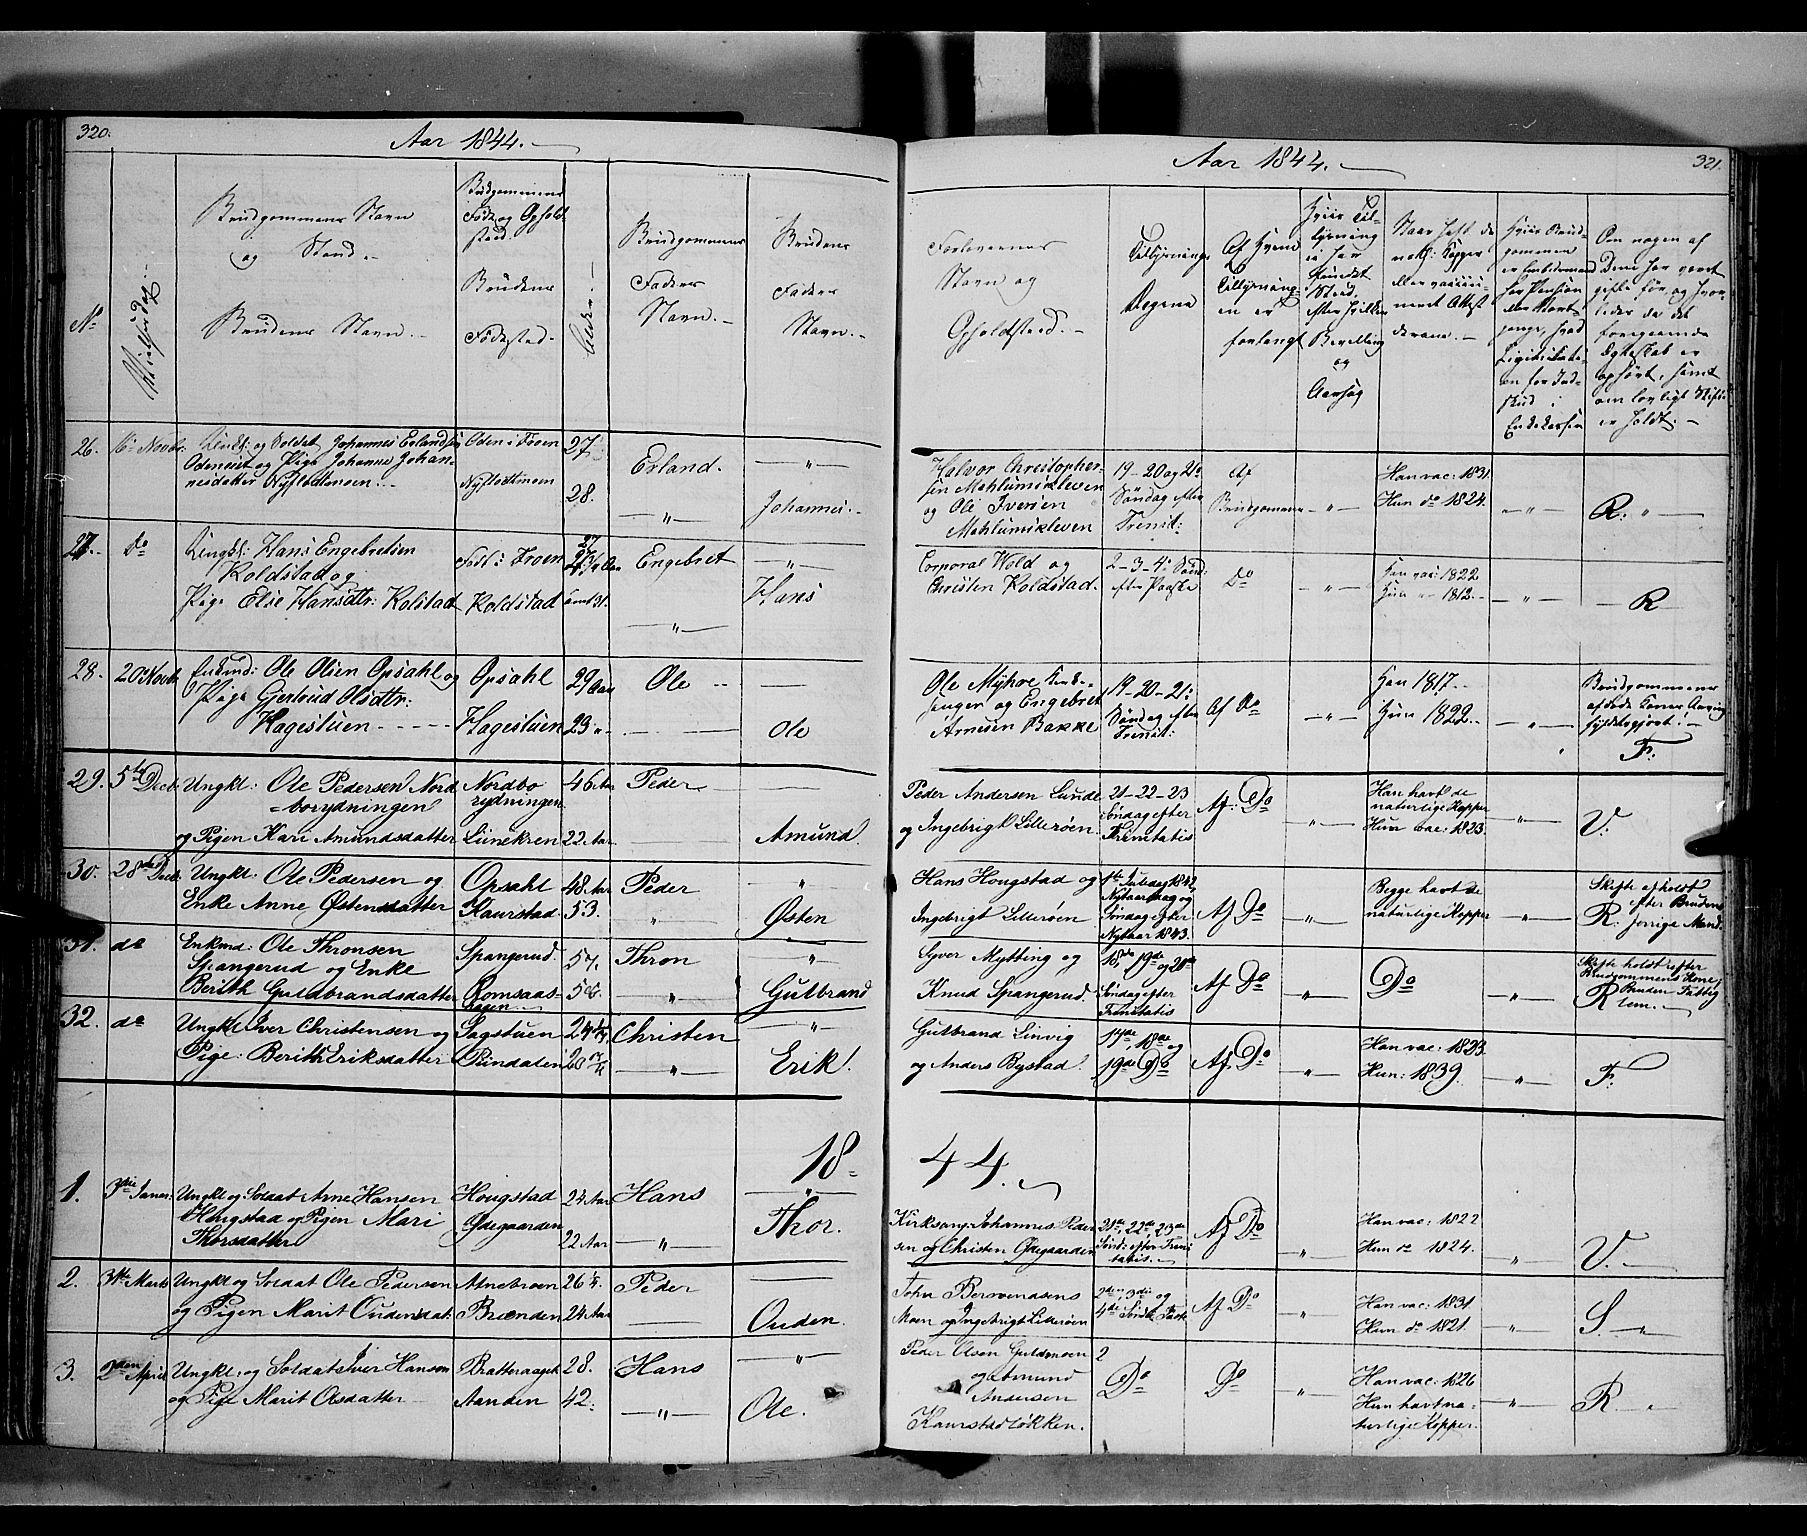 SAH, Ringebu prestekontor, Ministerialbok nr. 5, 1839-1848, s. 320-321